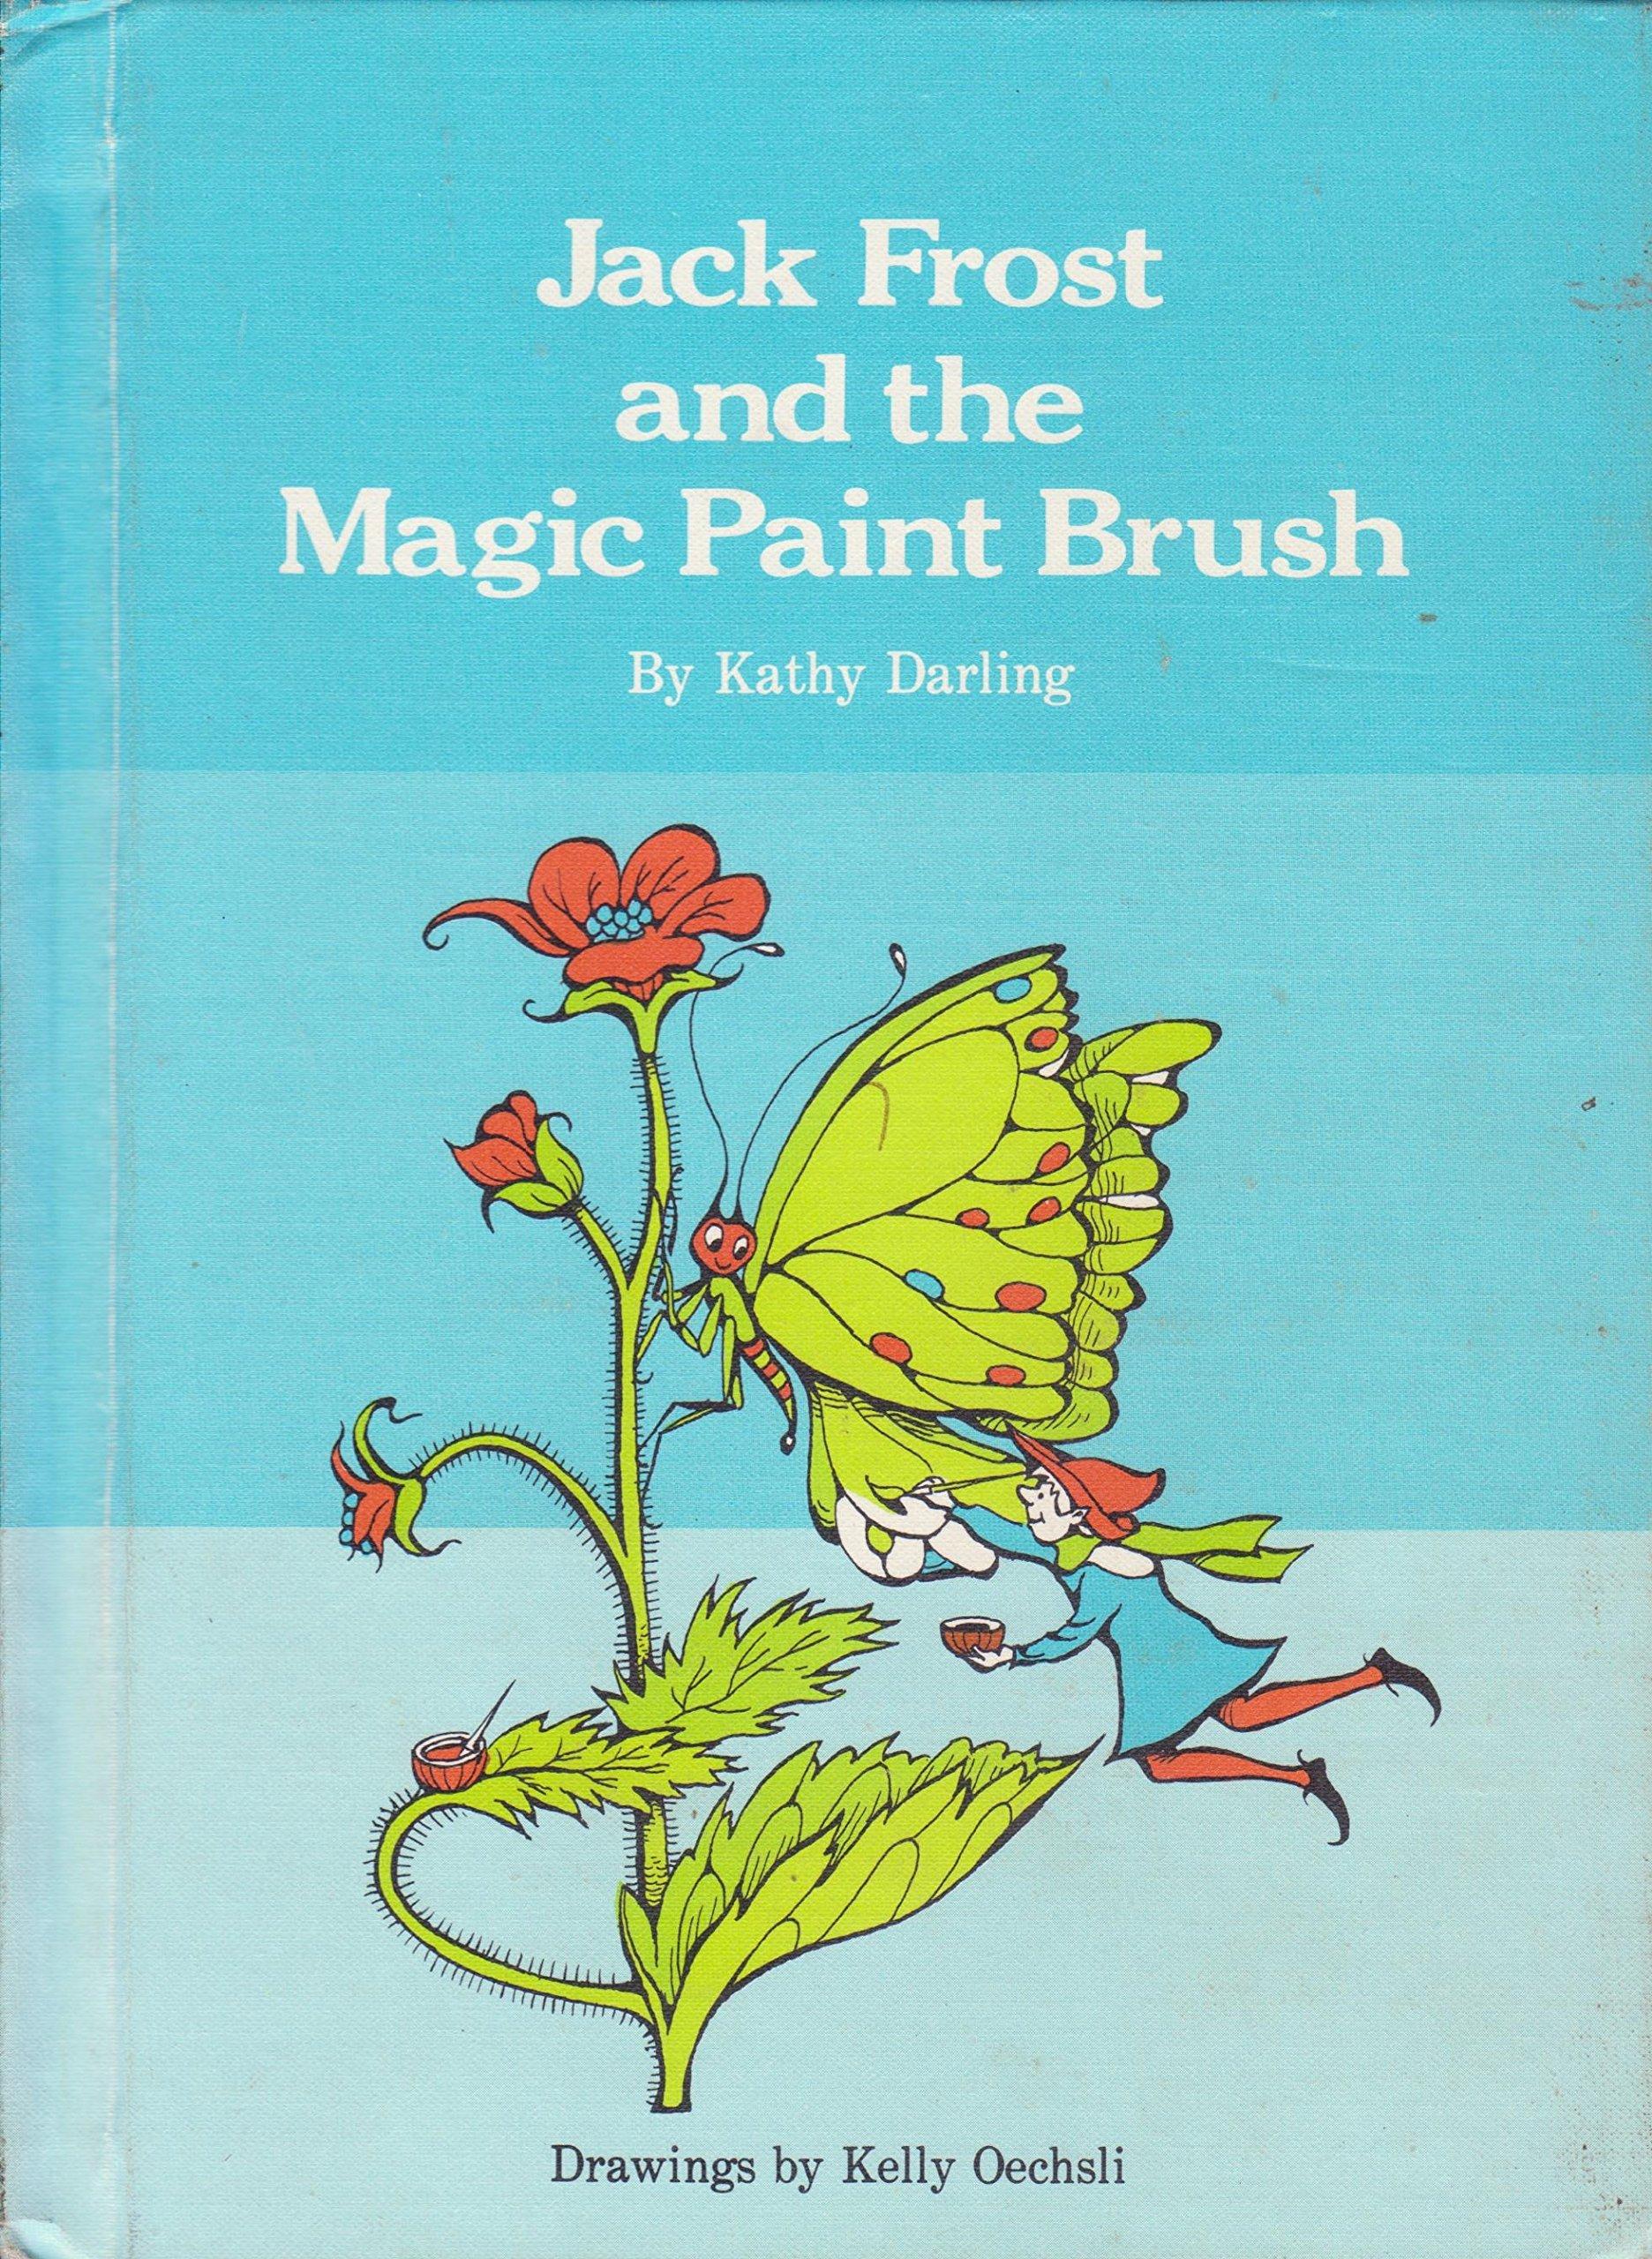 The Magic Paint